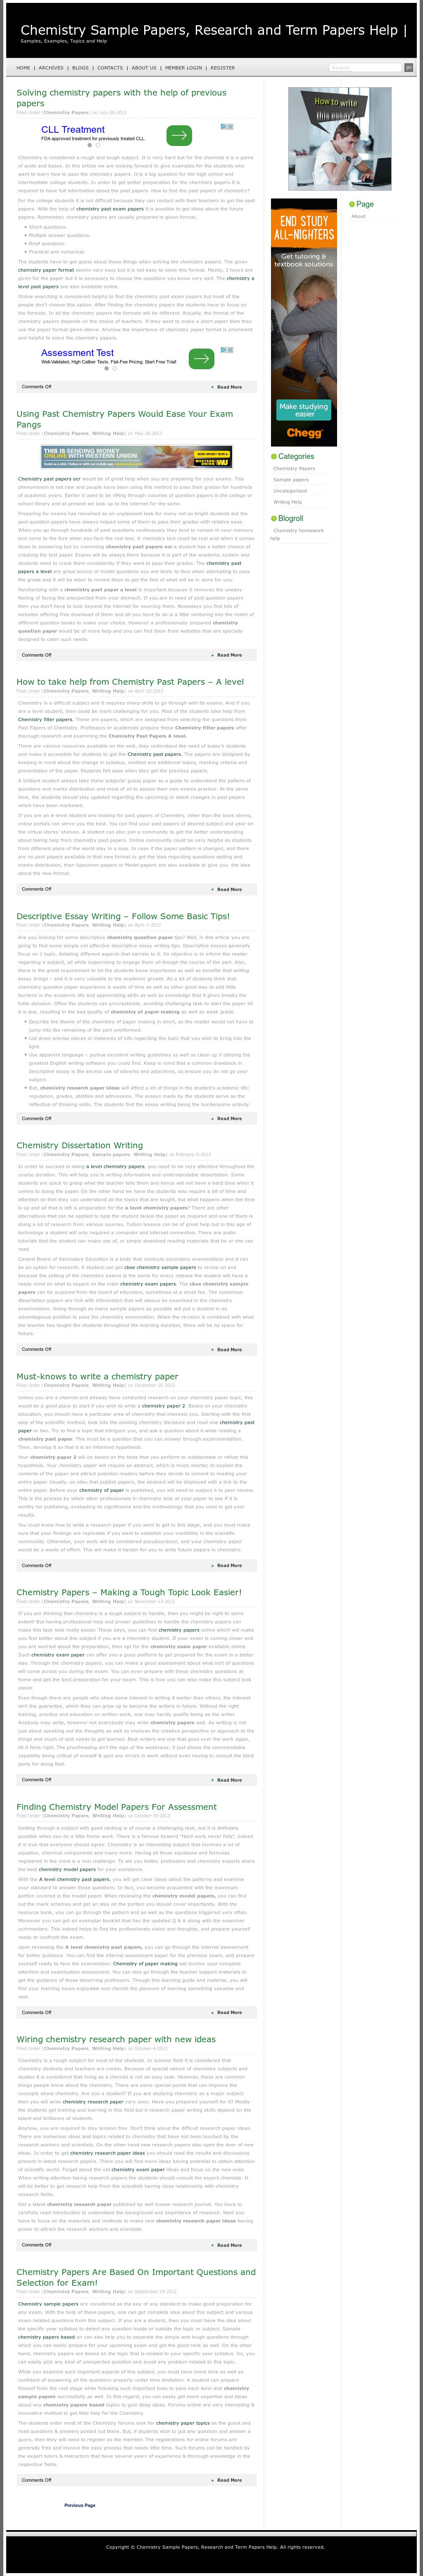 Custom dissertation conclusion writer service uk